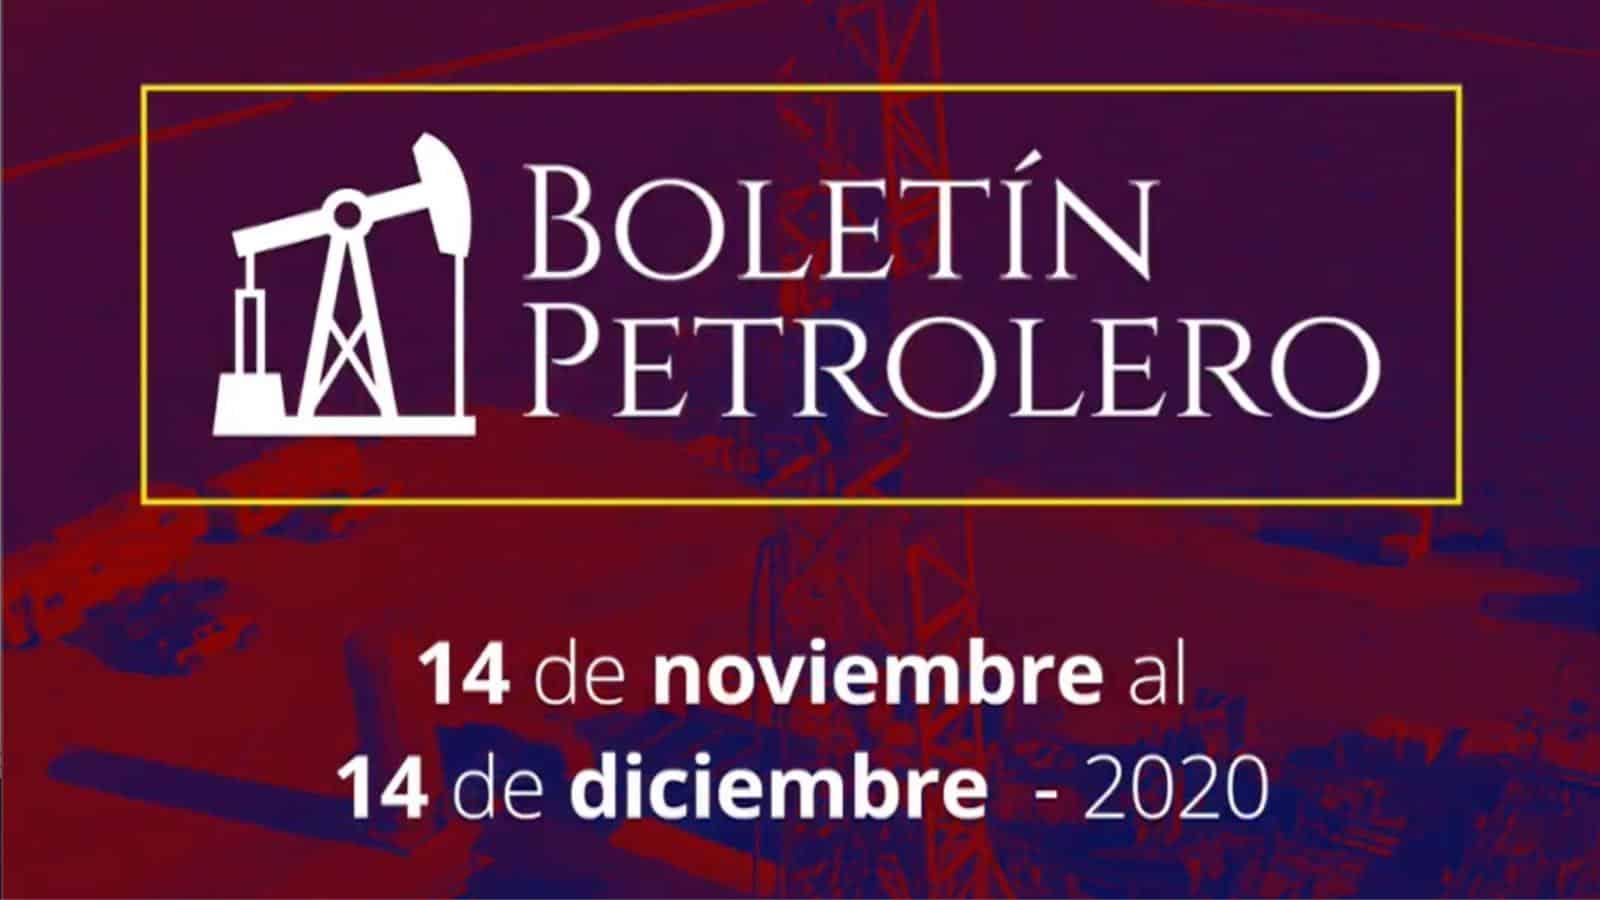 Boletín Petrolero del 14 de noviembre al 14 de diciembre